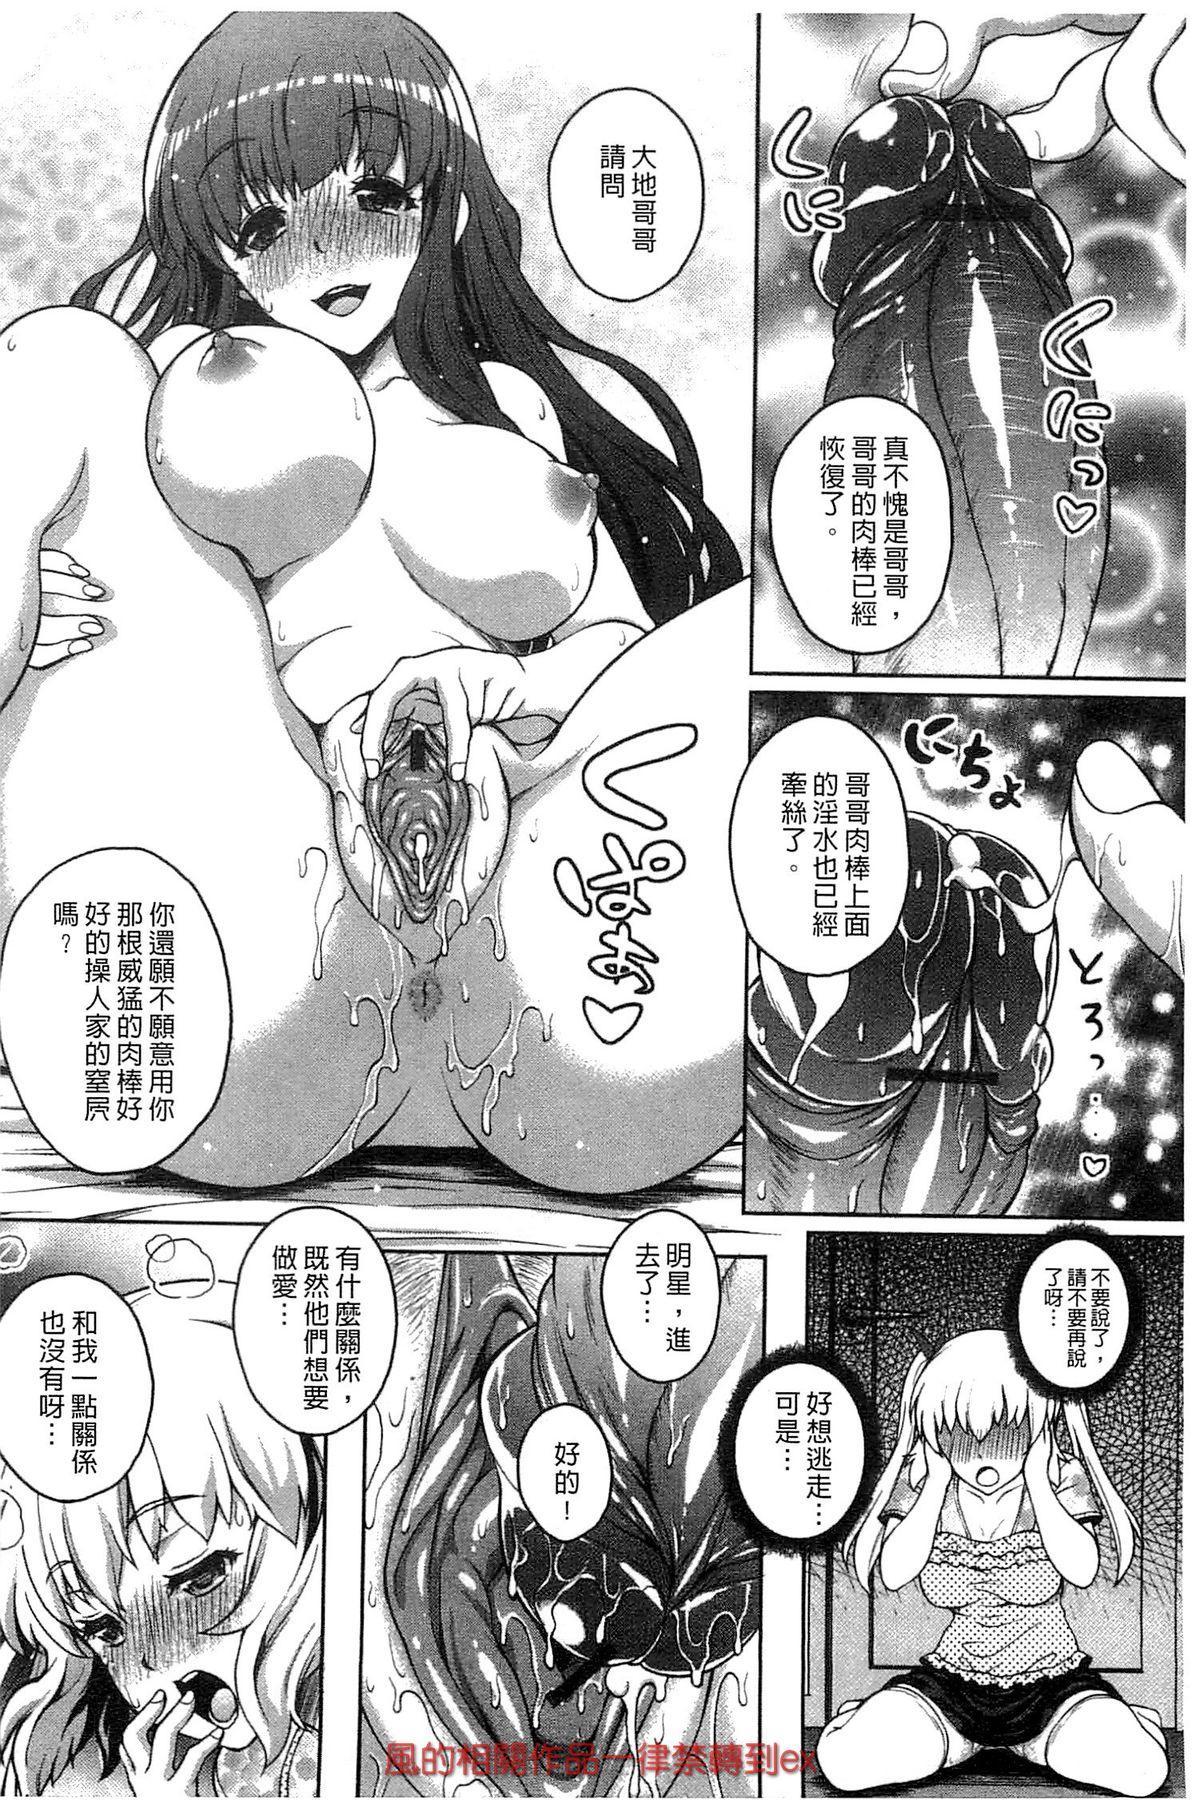 Hajimete nan da kara 144